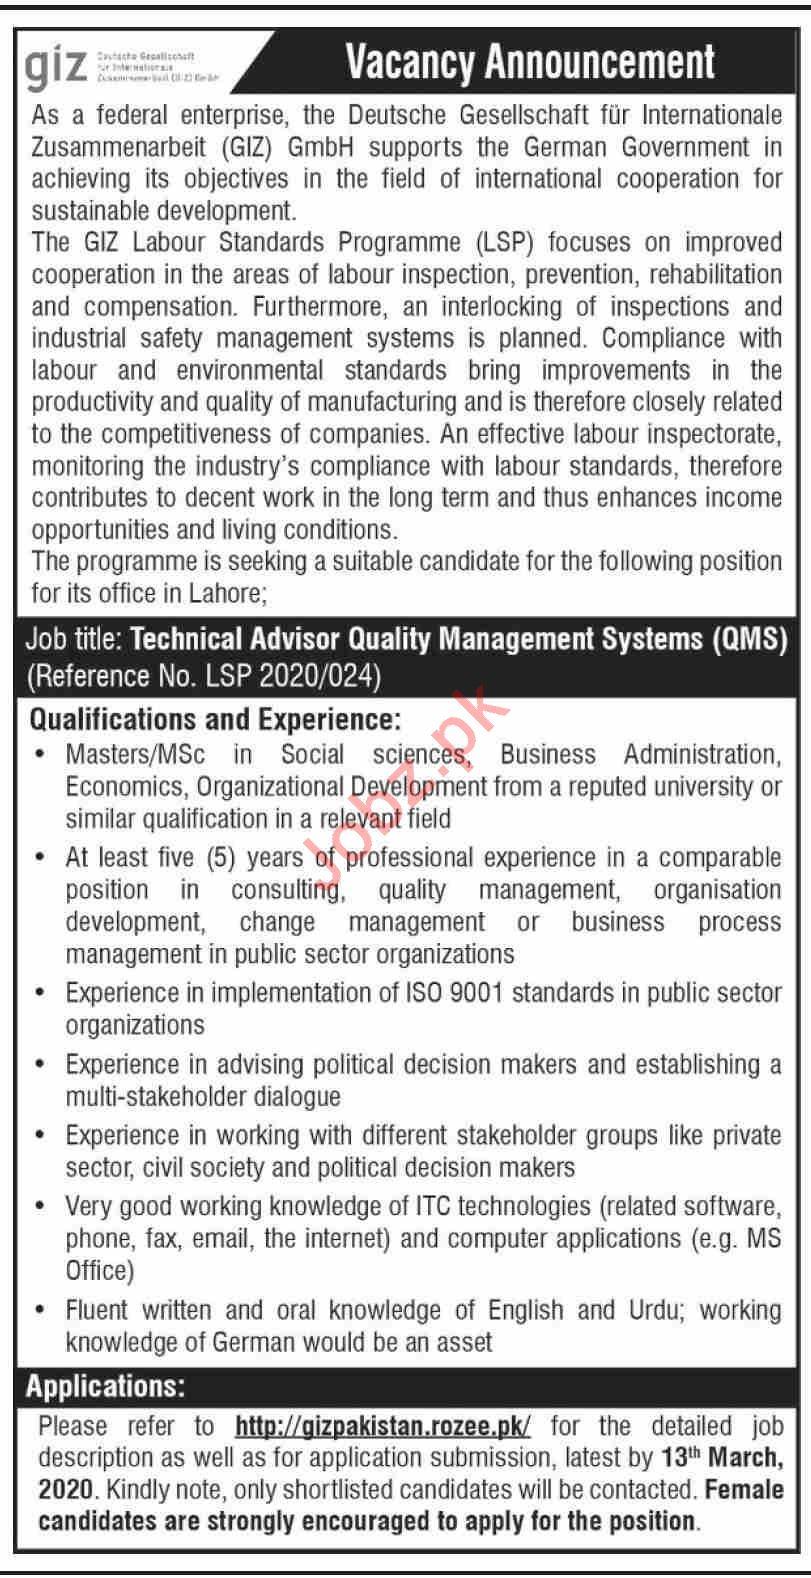 GIZ Pakistan Jobs 2020 for QMS in Lahore